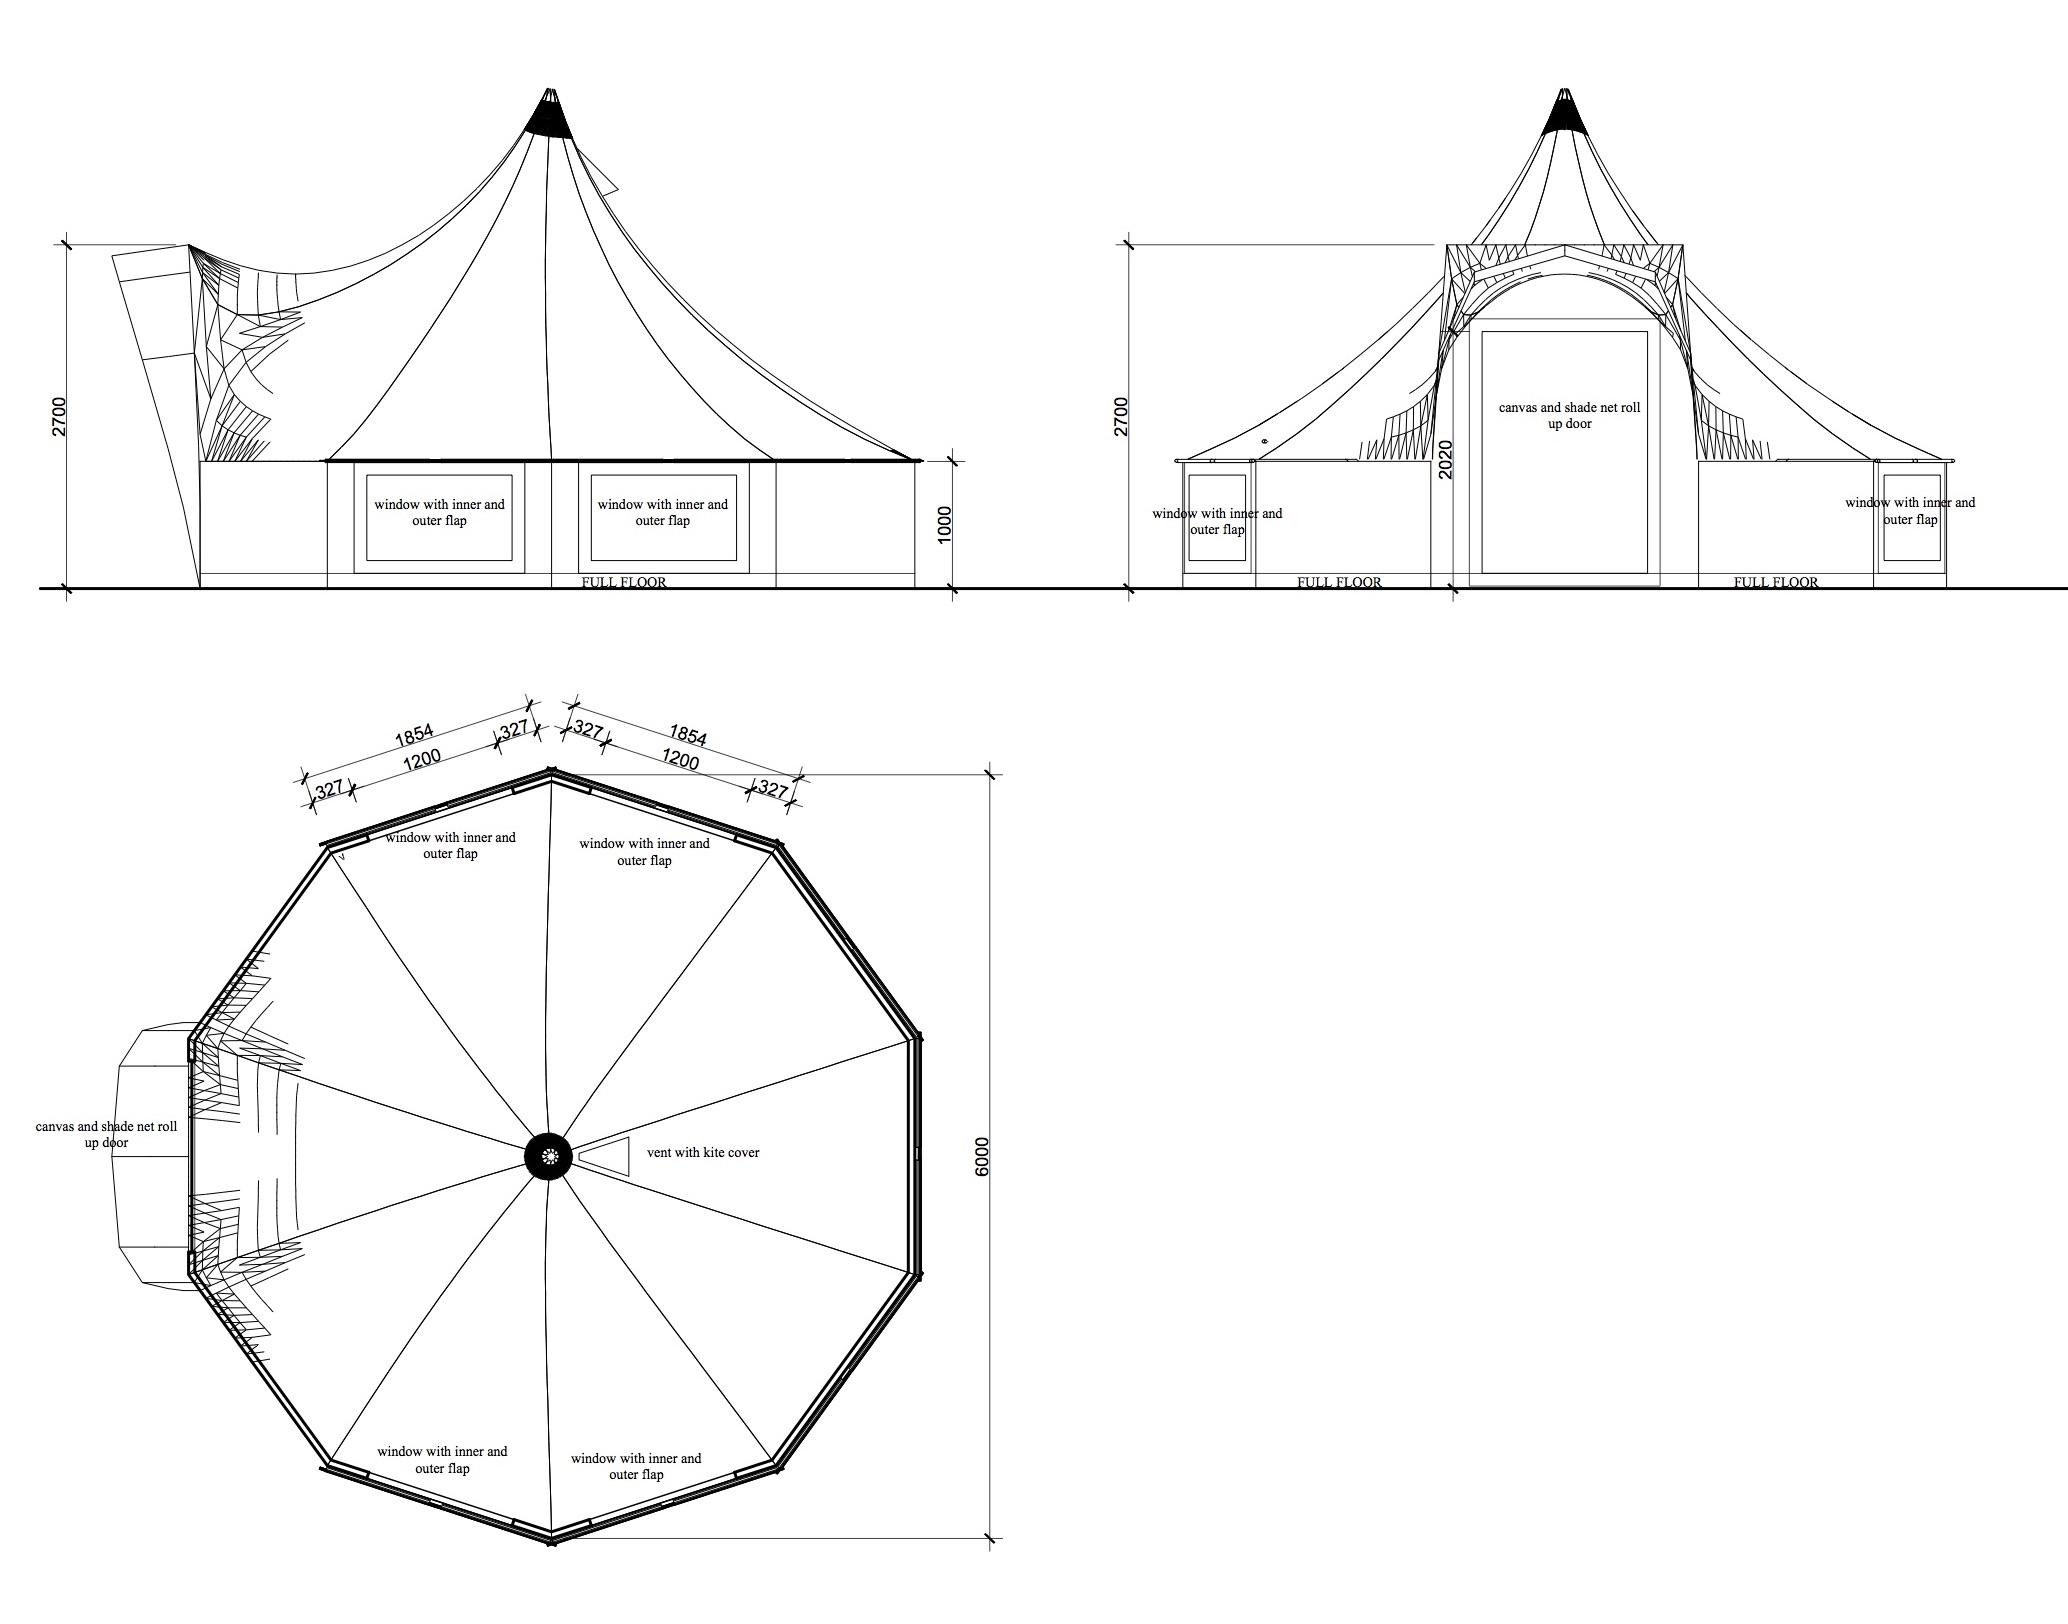 2068x1624 Exclusive Tents International